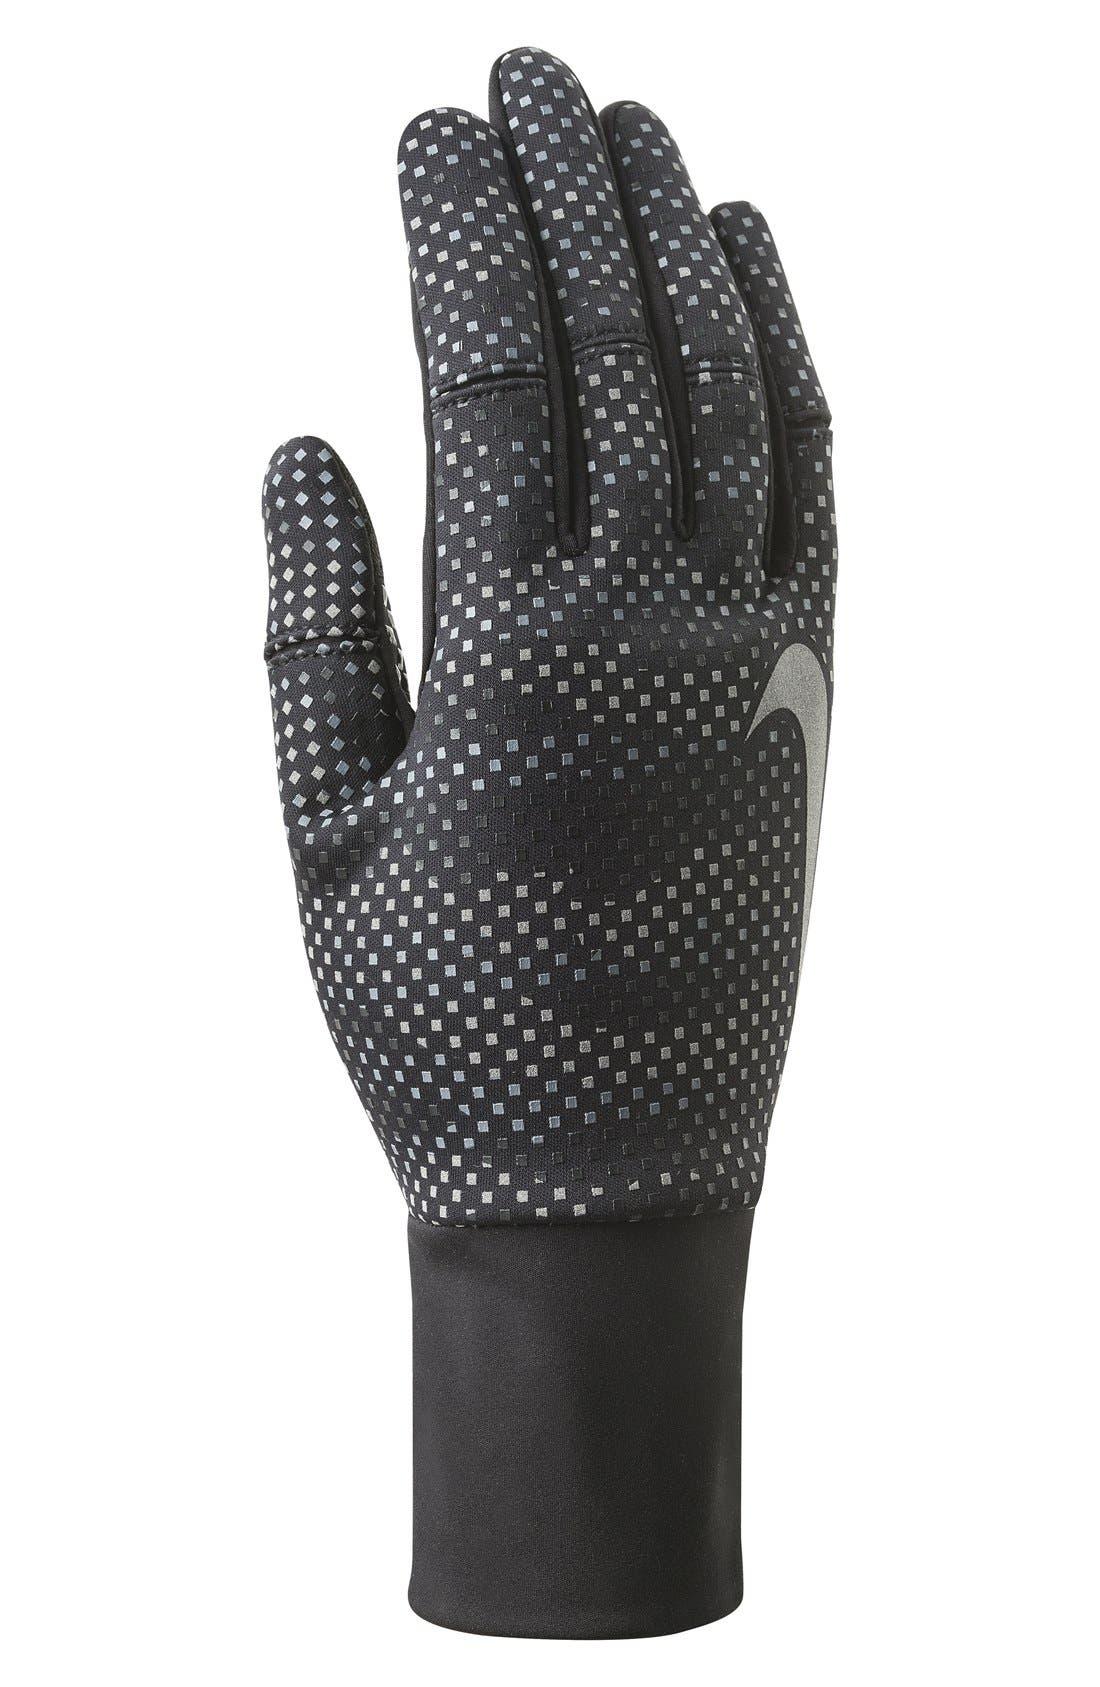 NIKE 'Vapor Flash 2.0' Gloves, Main, color, 078